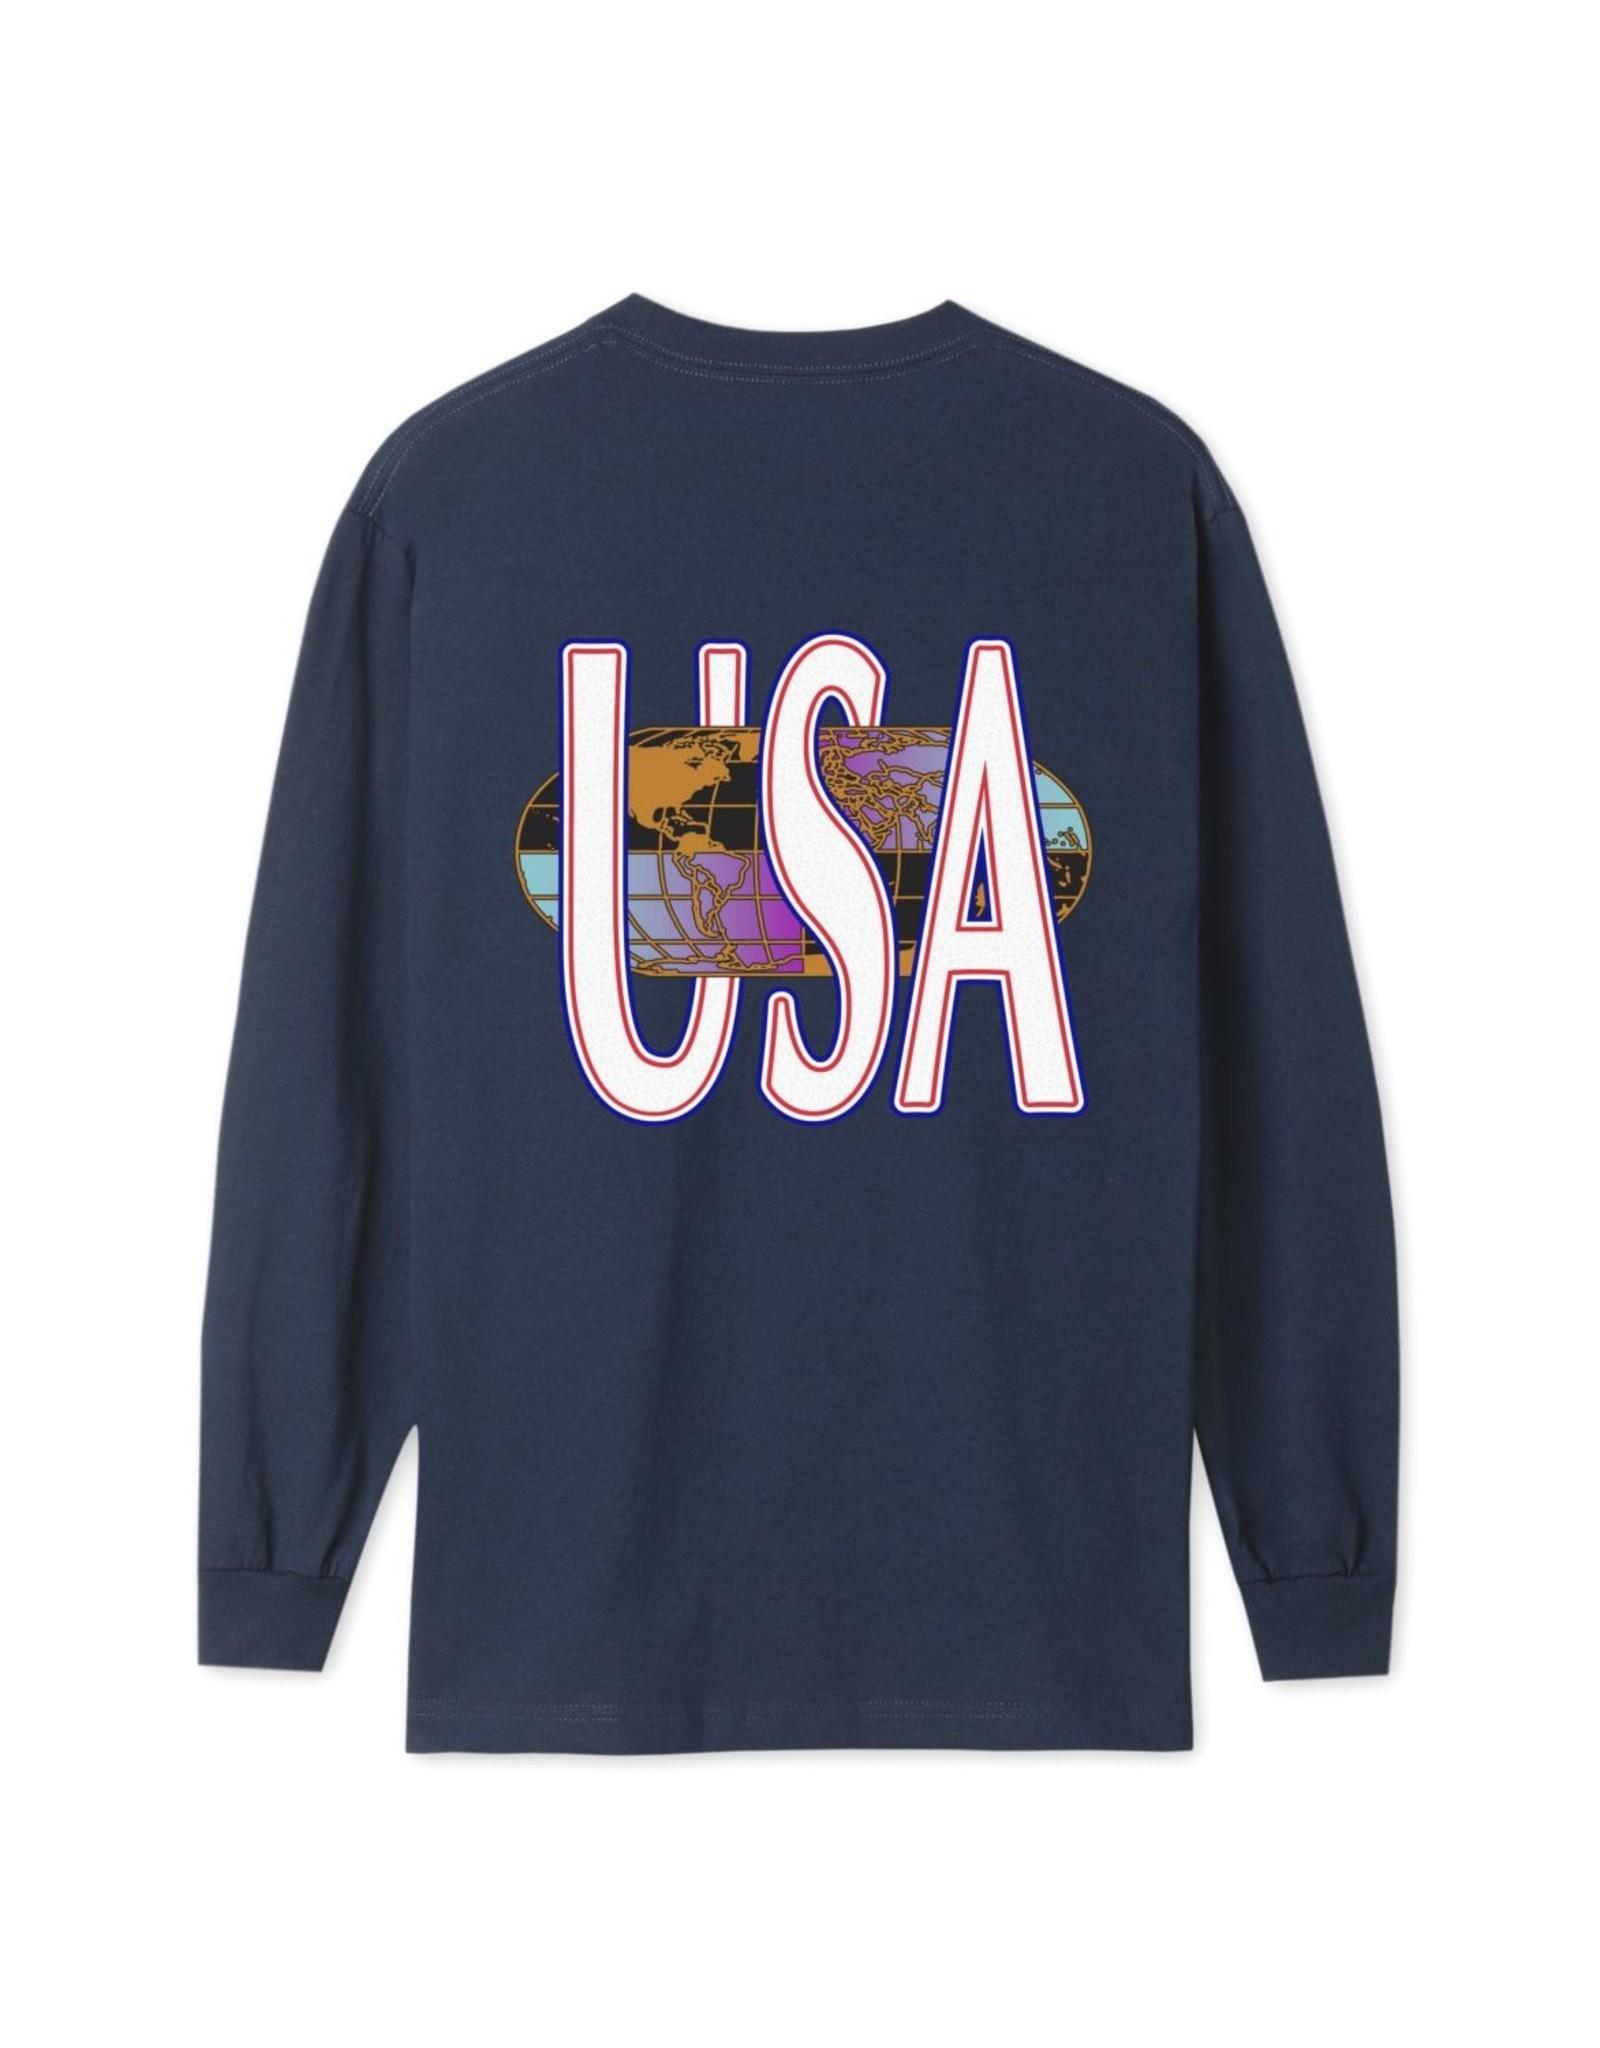 HUF HUF - QUAKE USA L/S - NAVY